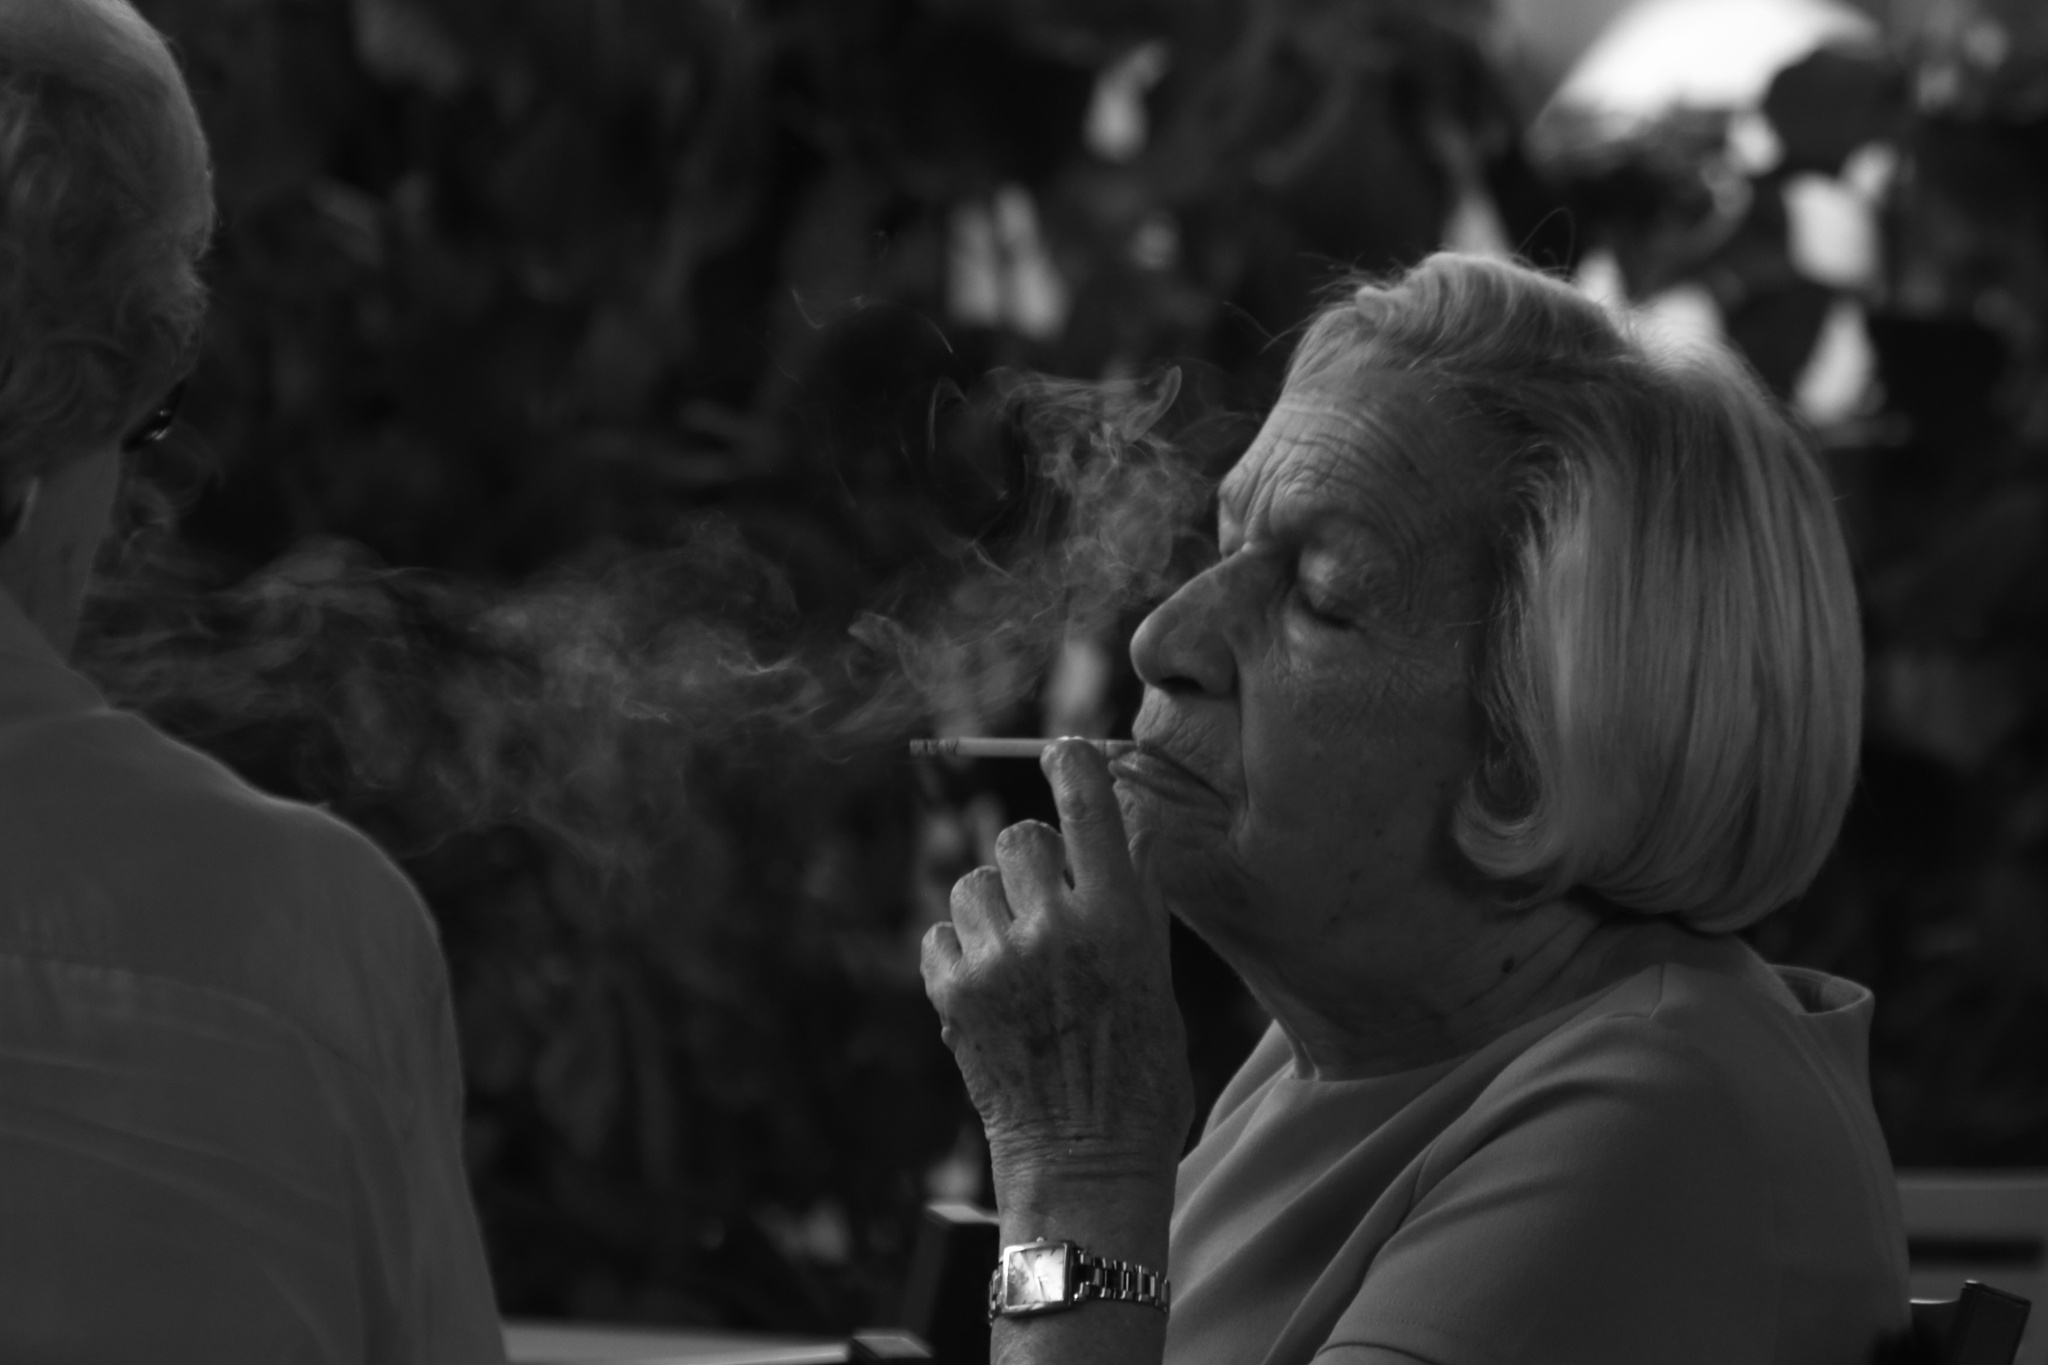 Addiction by Nicola Pellegrineschi